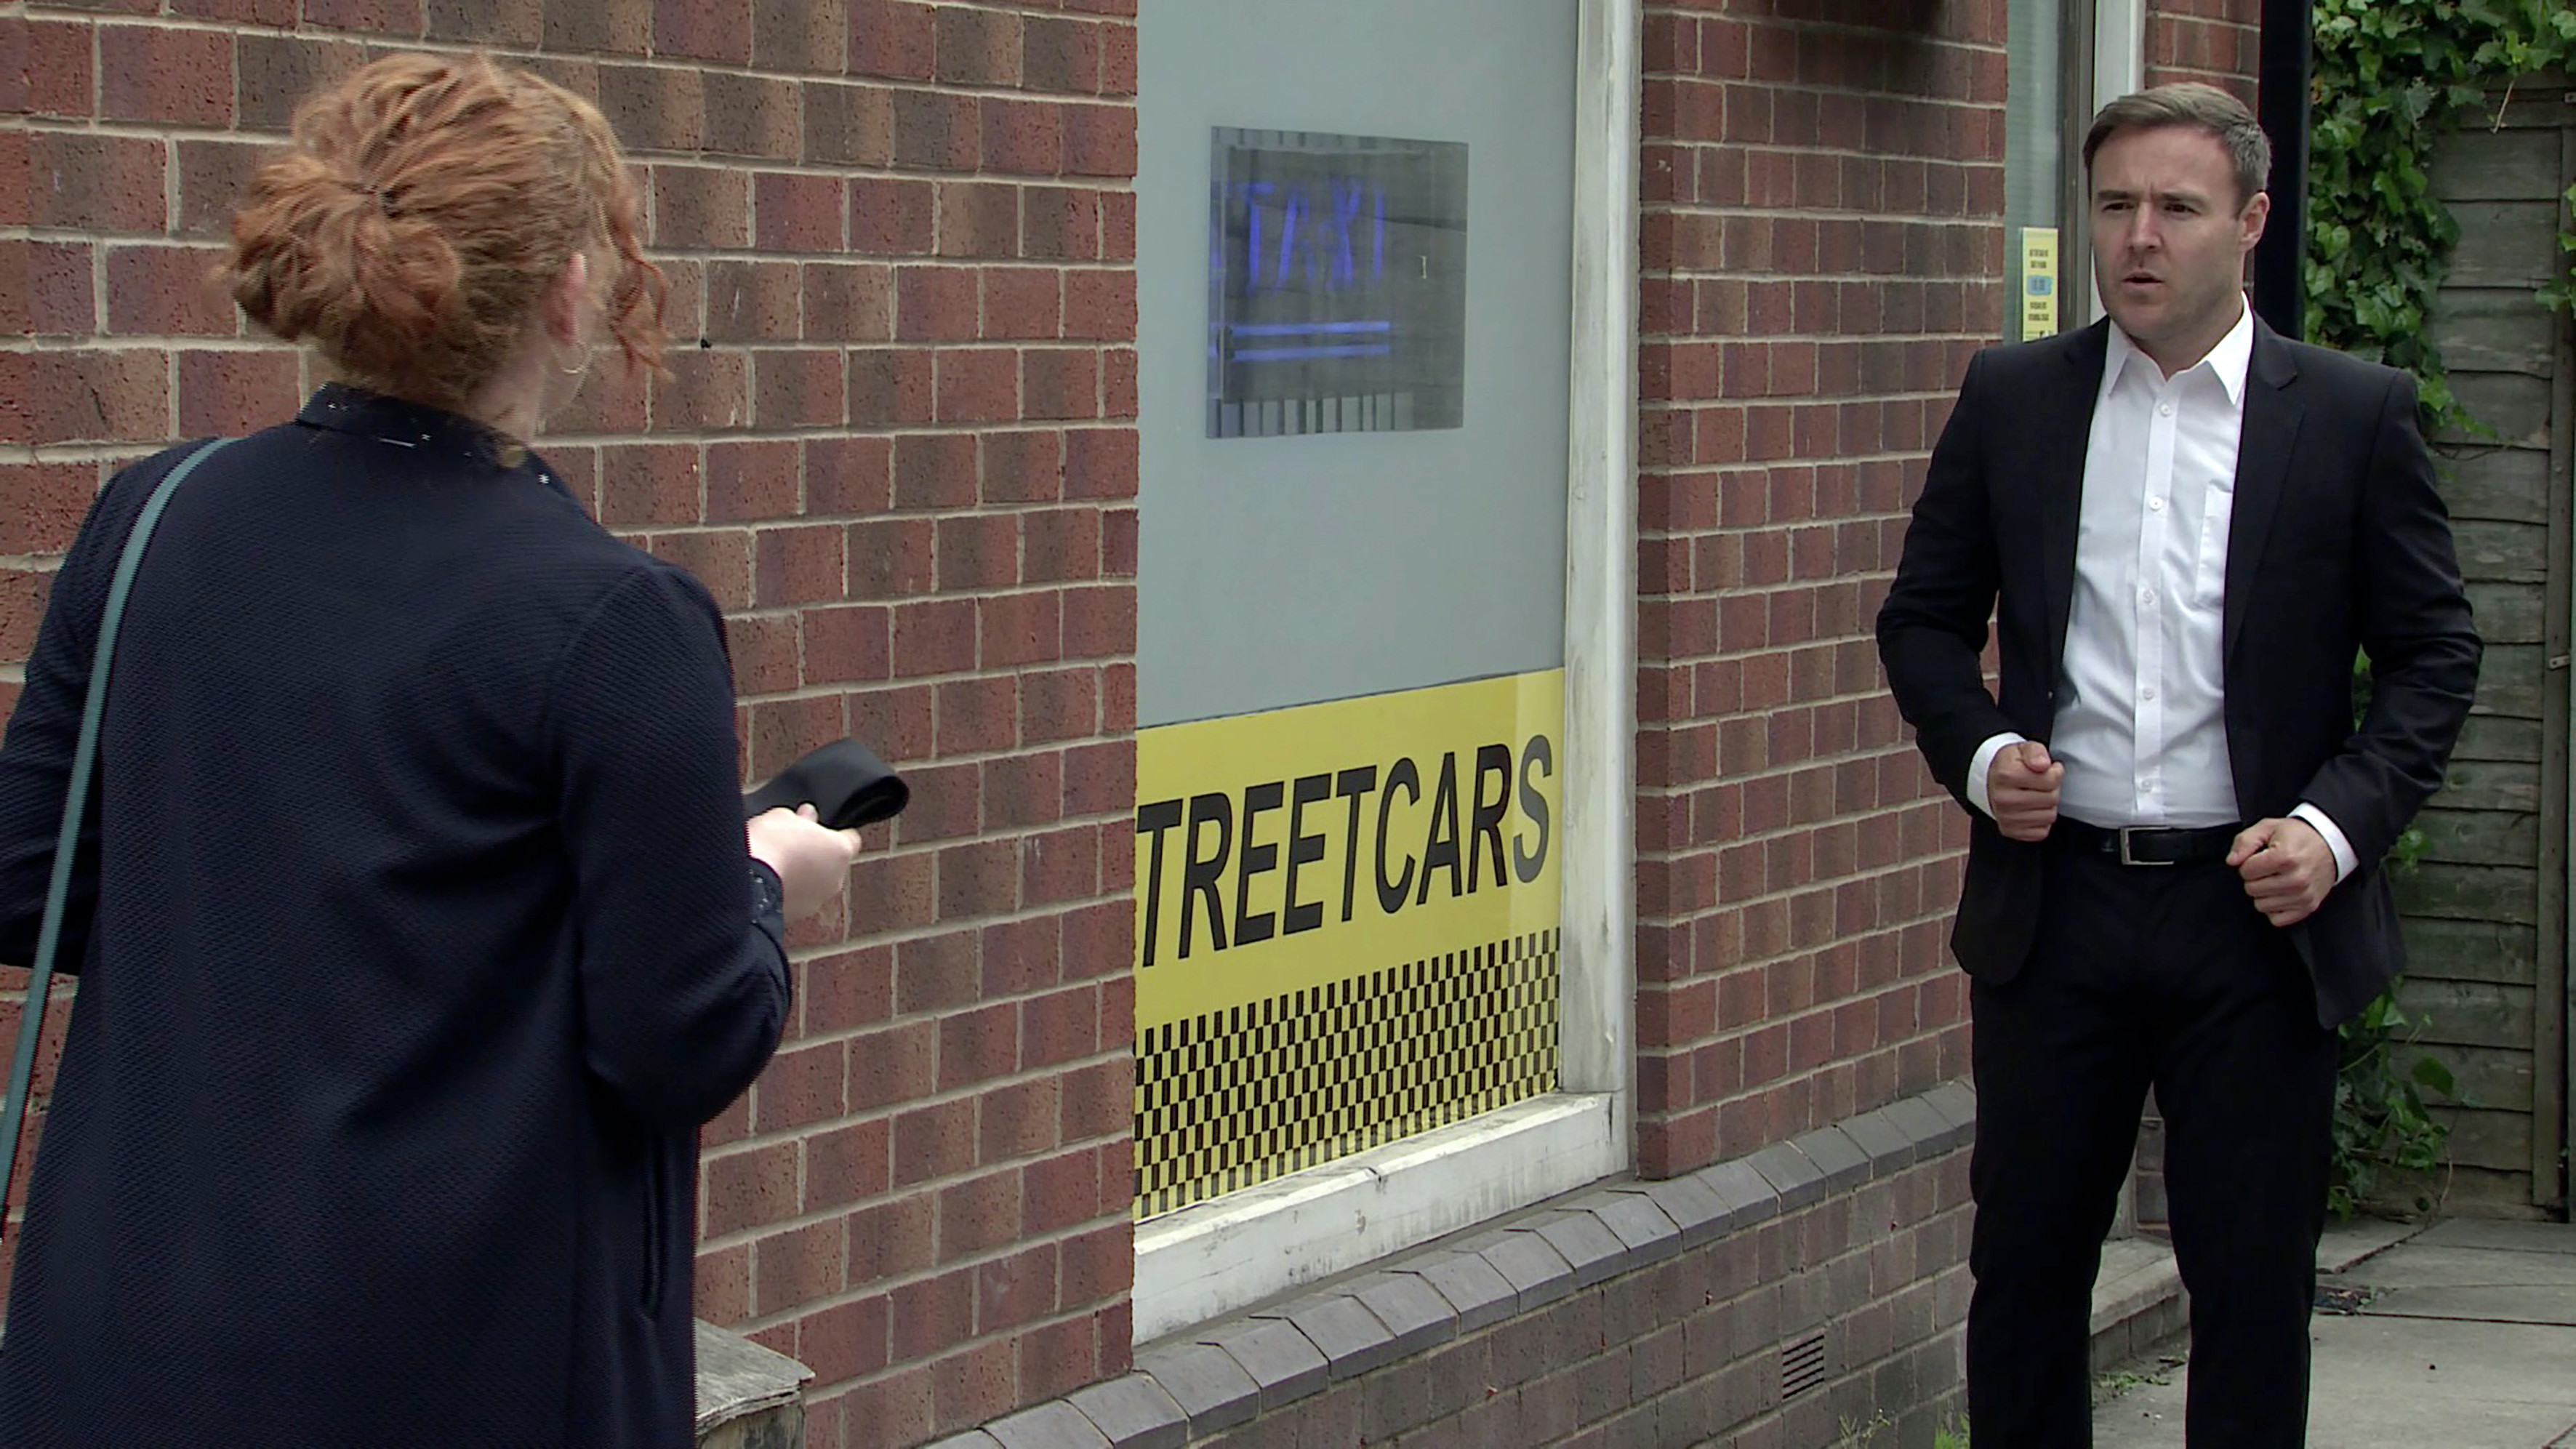 Coronation Street spoilers: Fiz Stape helps Tyrone Dobbs after a sudden death